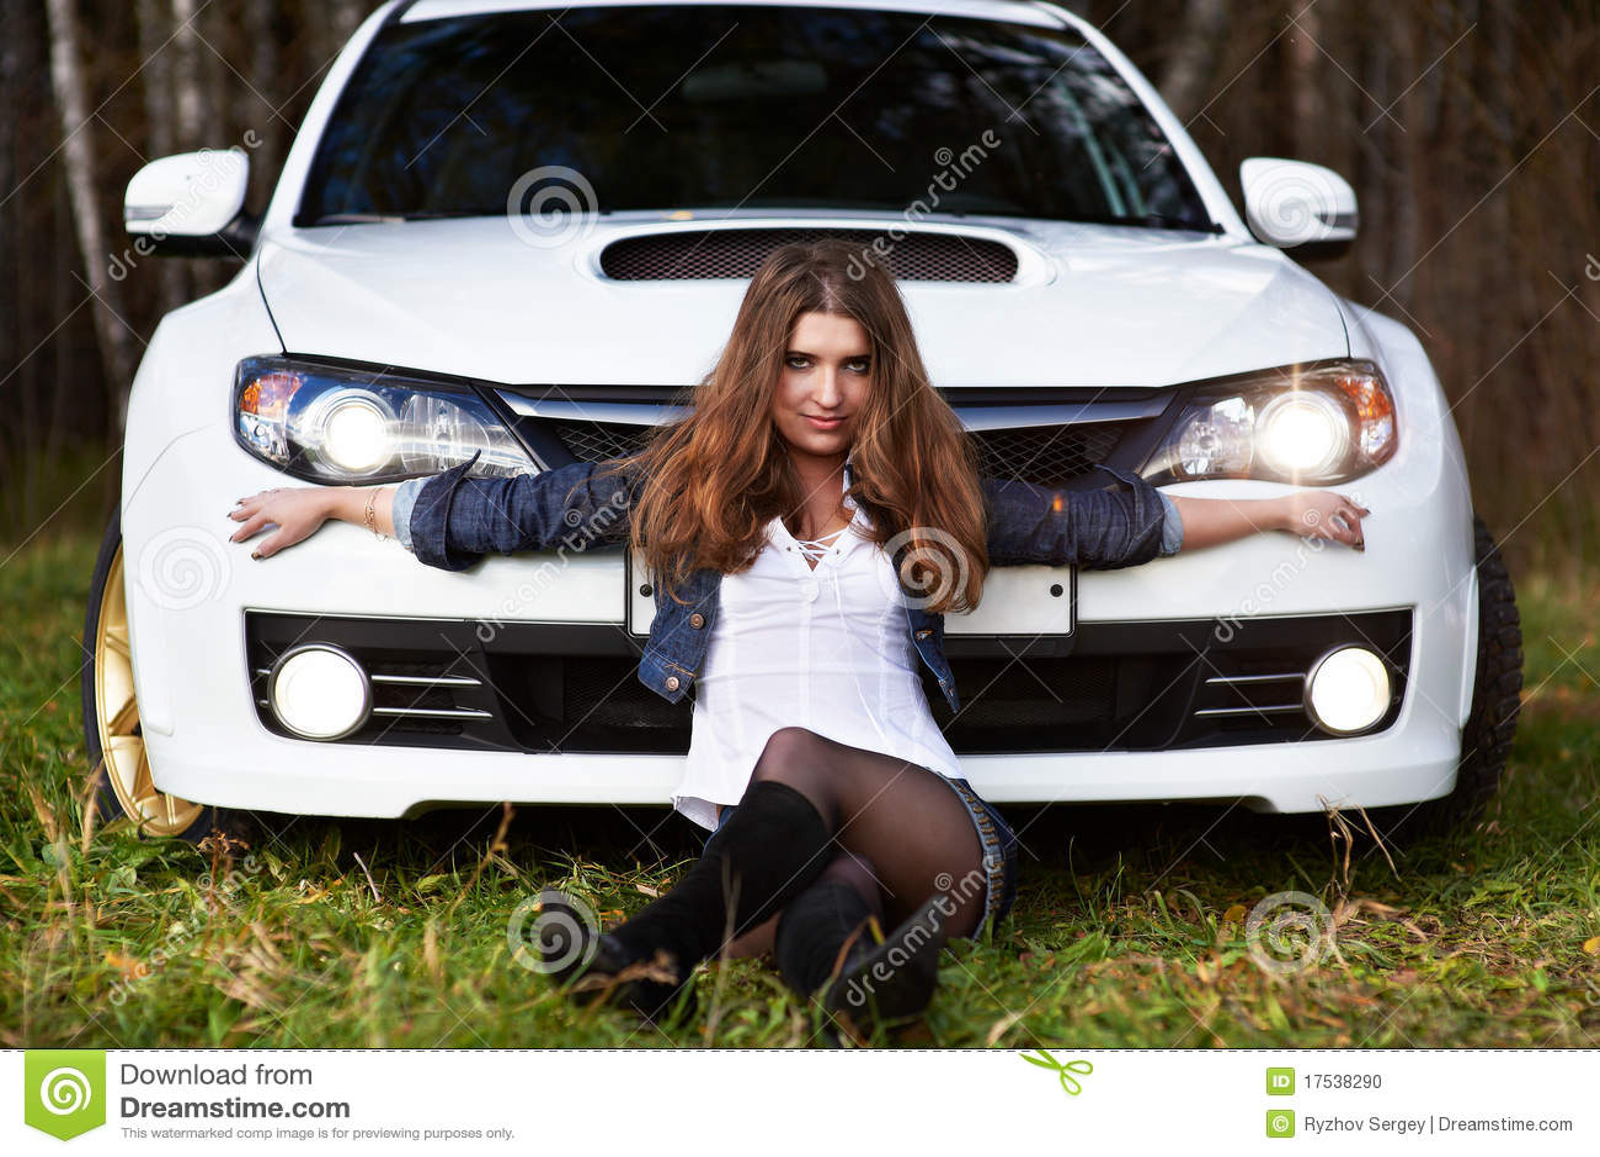 Фото идеи девушки с машиной